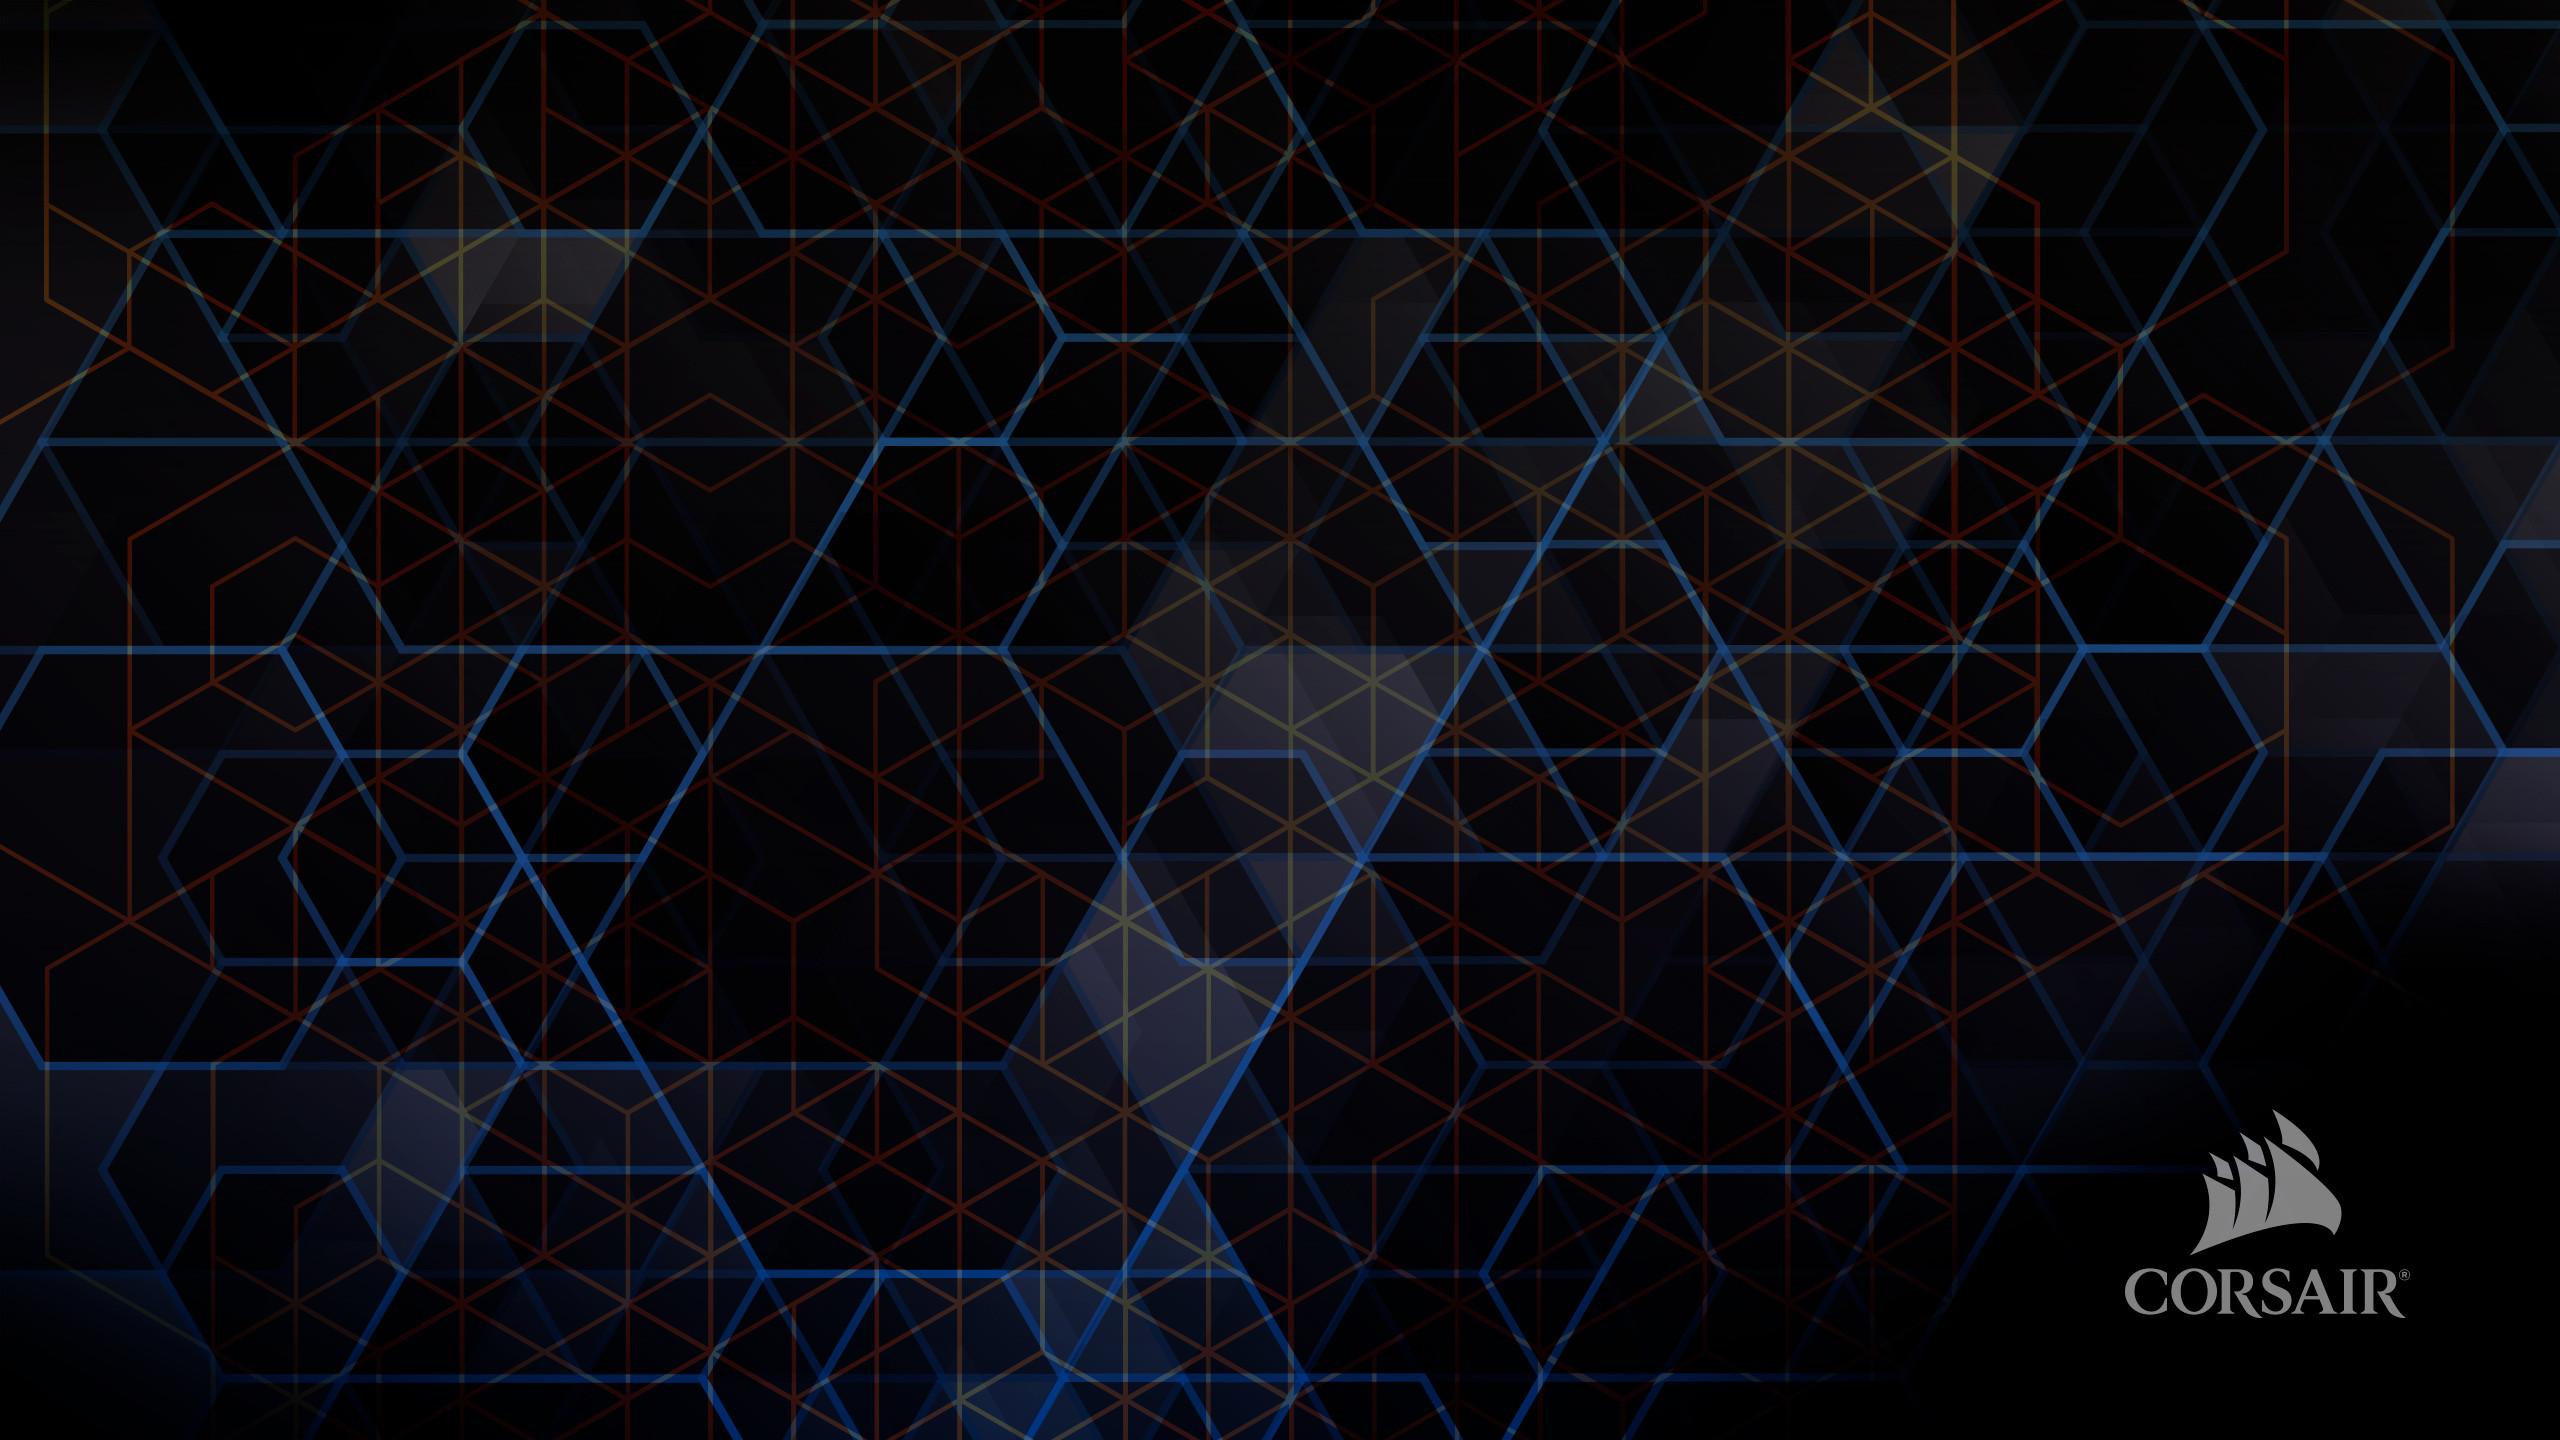 2560x1440 wallpaper 81 images